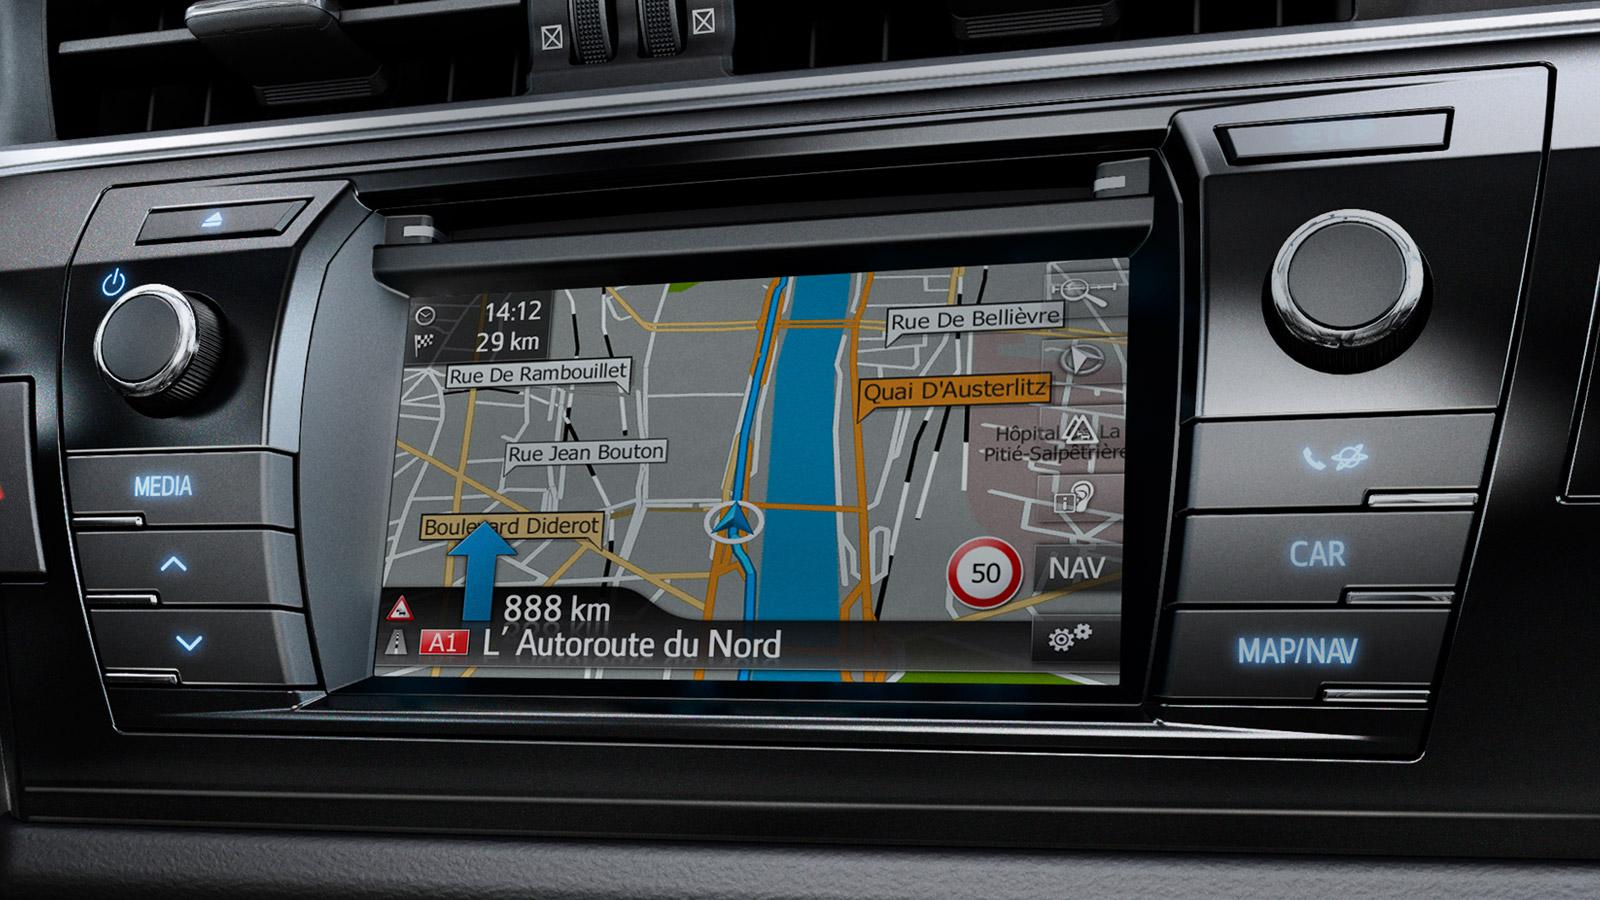 Toyota Touch 2 Muziek Navigatie En Bluetooth In 233 233 N